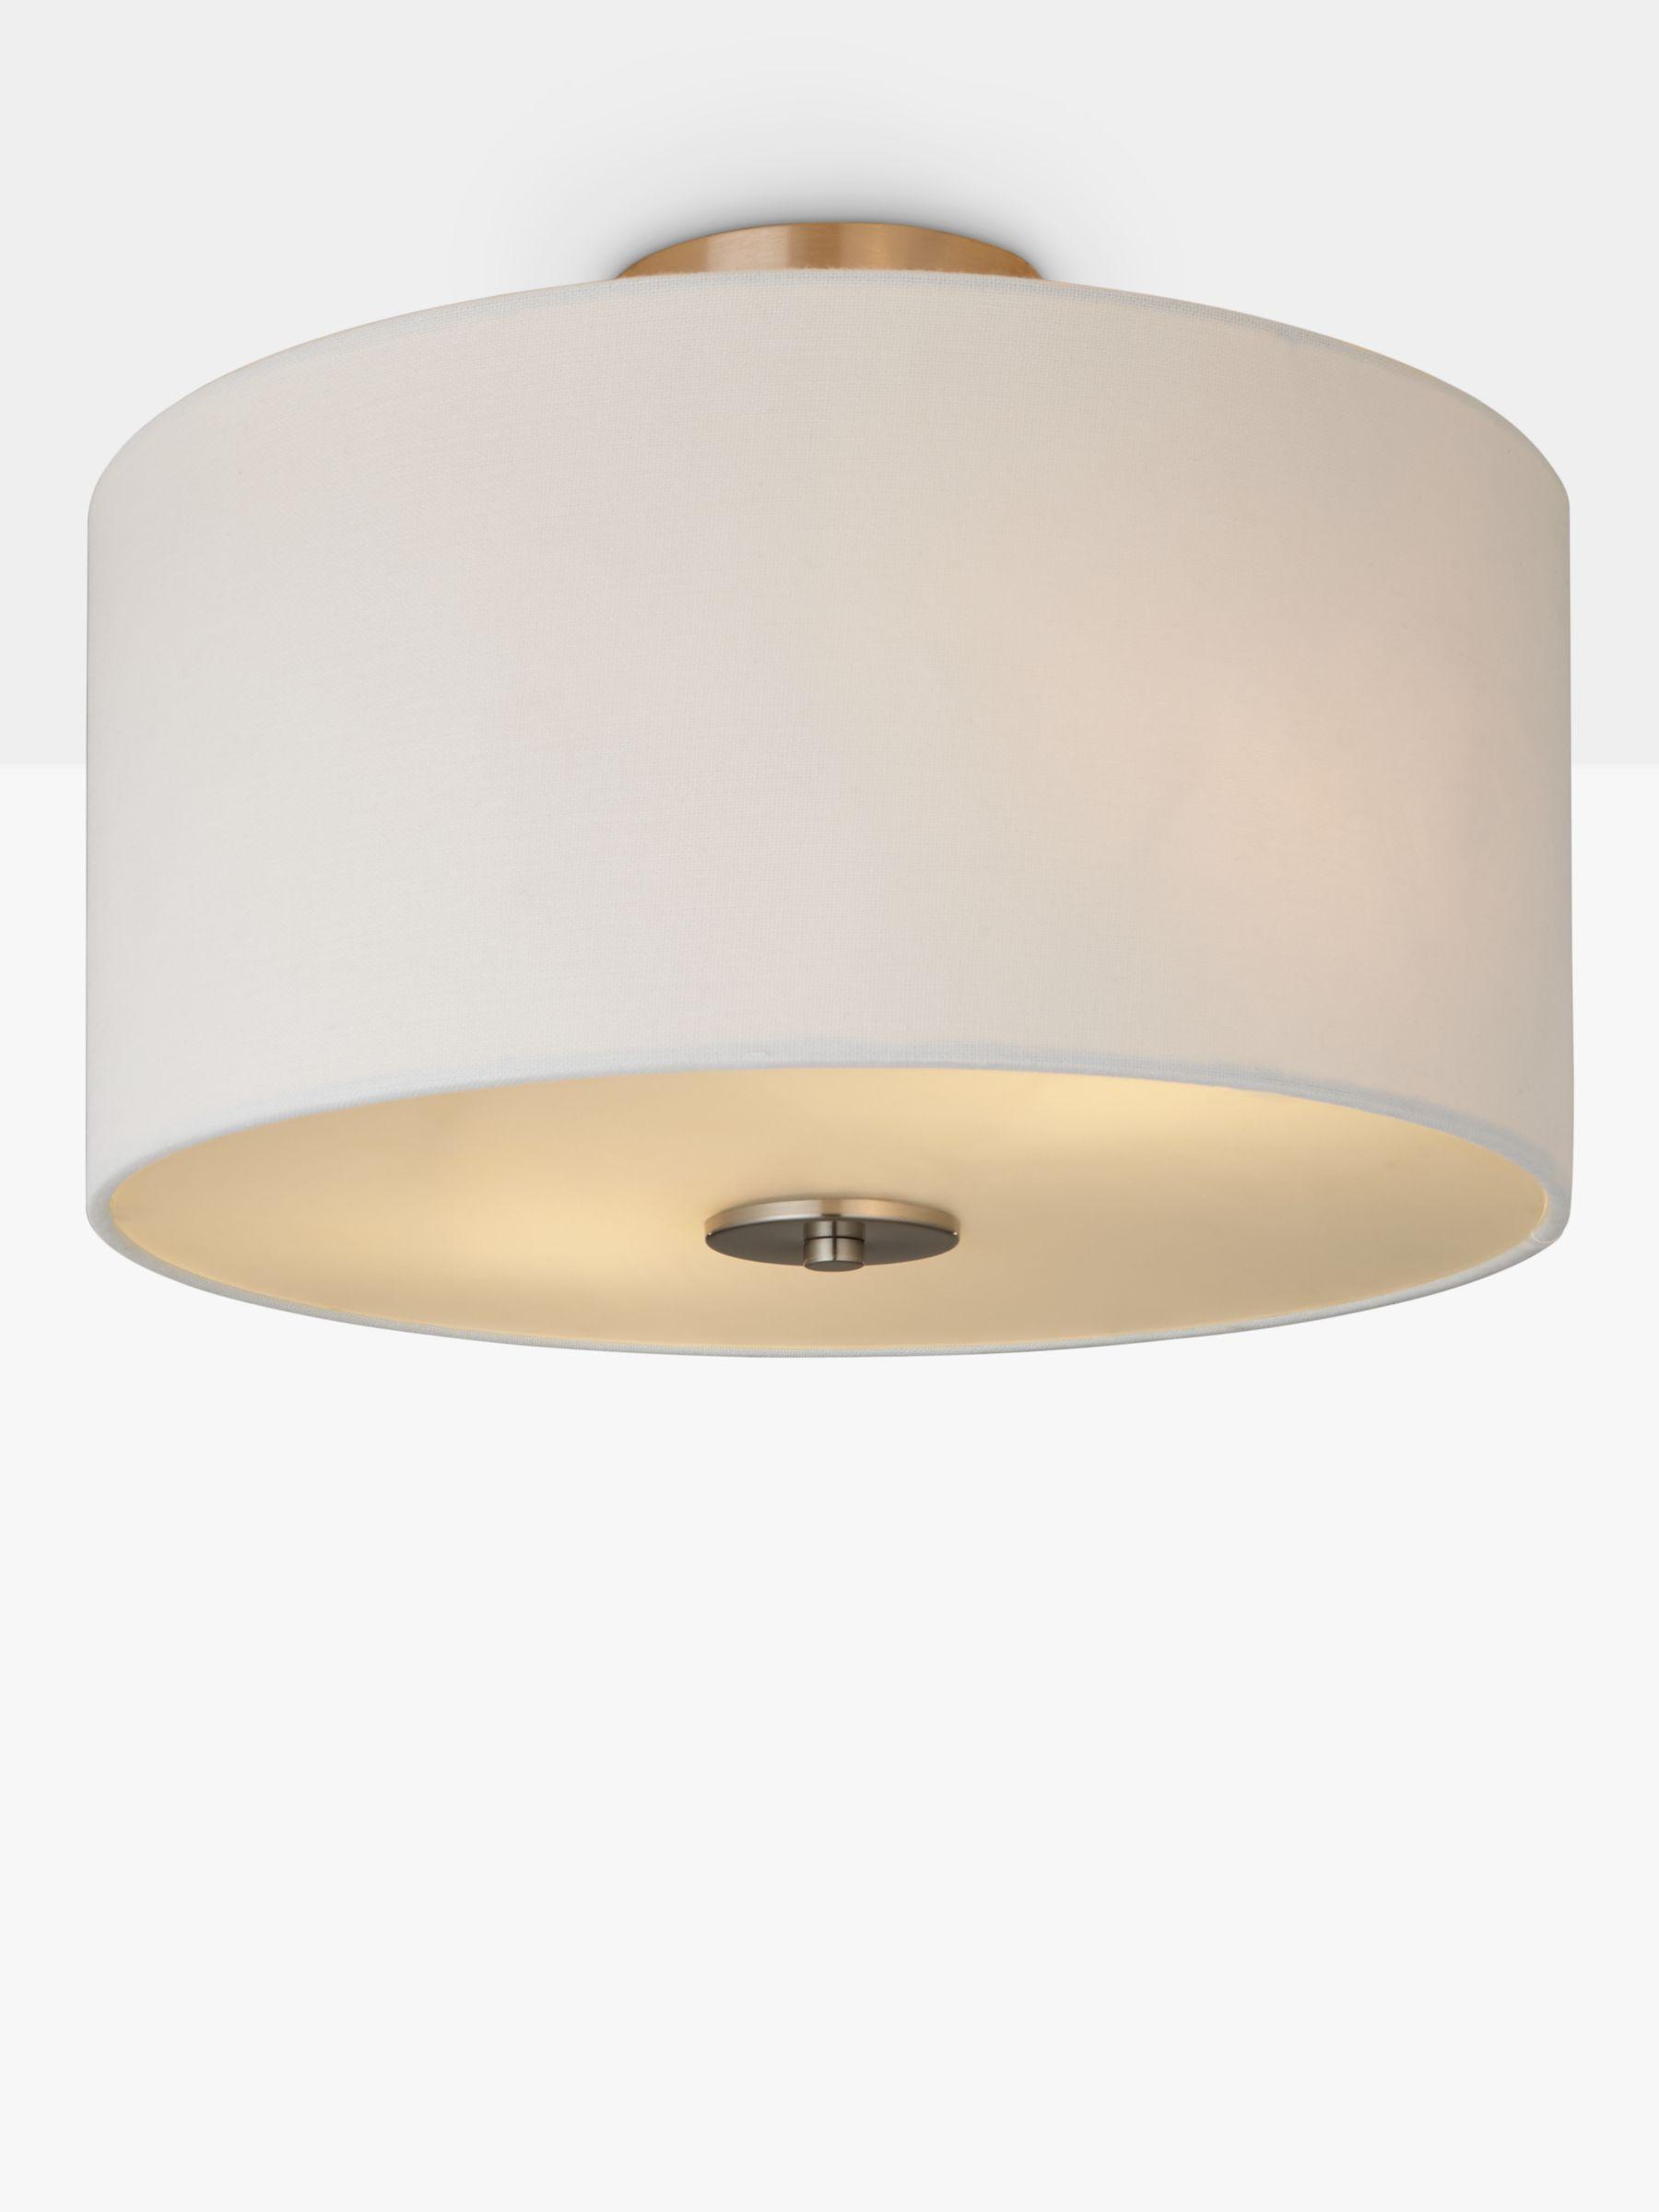 Ralph Lauren Pendant Lights